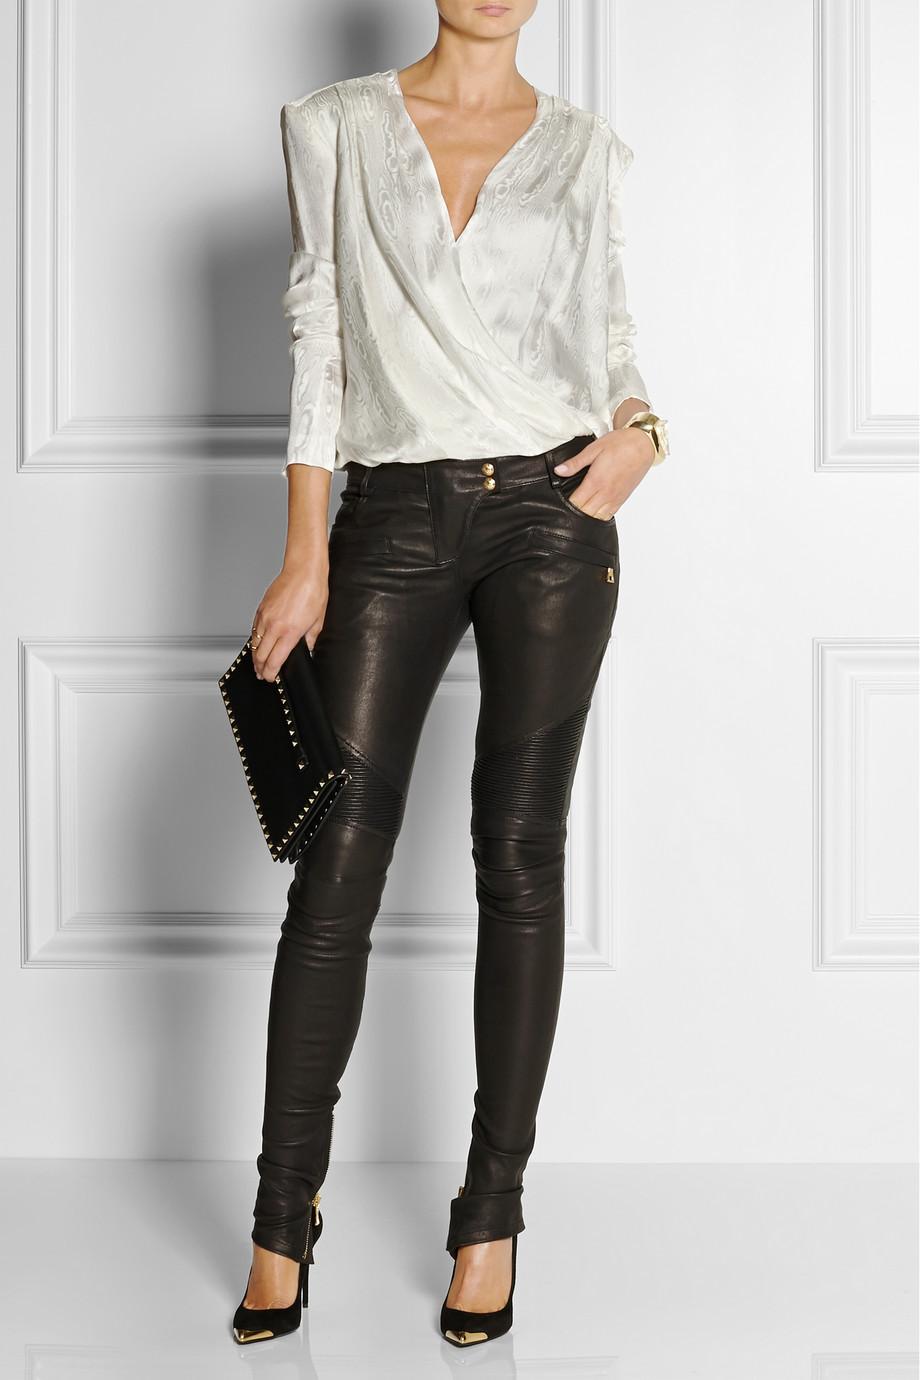 Lyst Balmain Wrap Effect Silk Jacquard Blouse In White